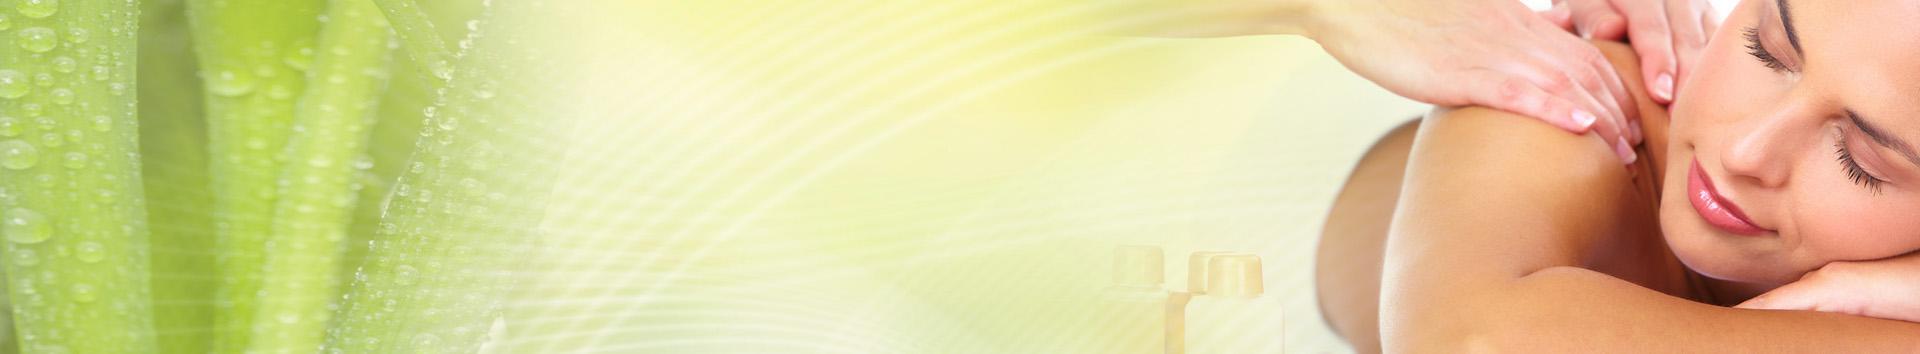 site-pagebanner-category-beauty101UdSCO0KKBQ